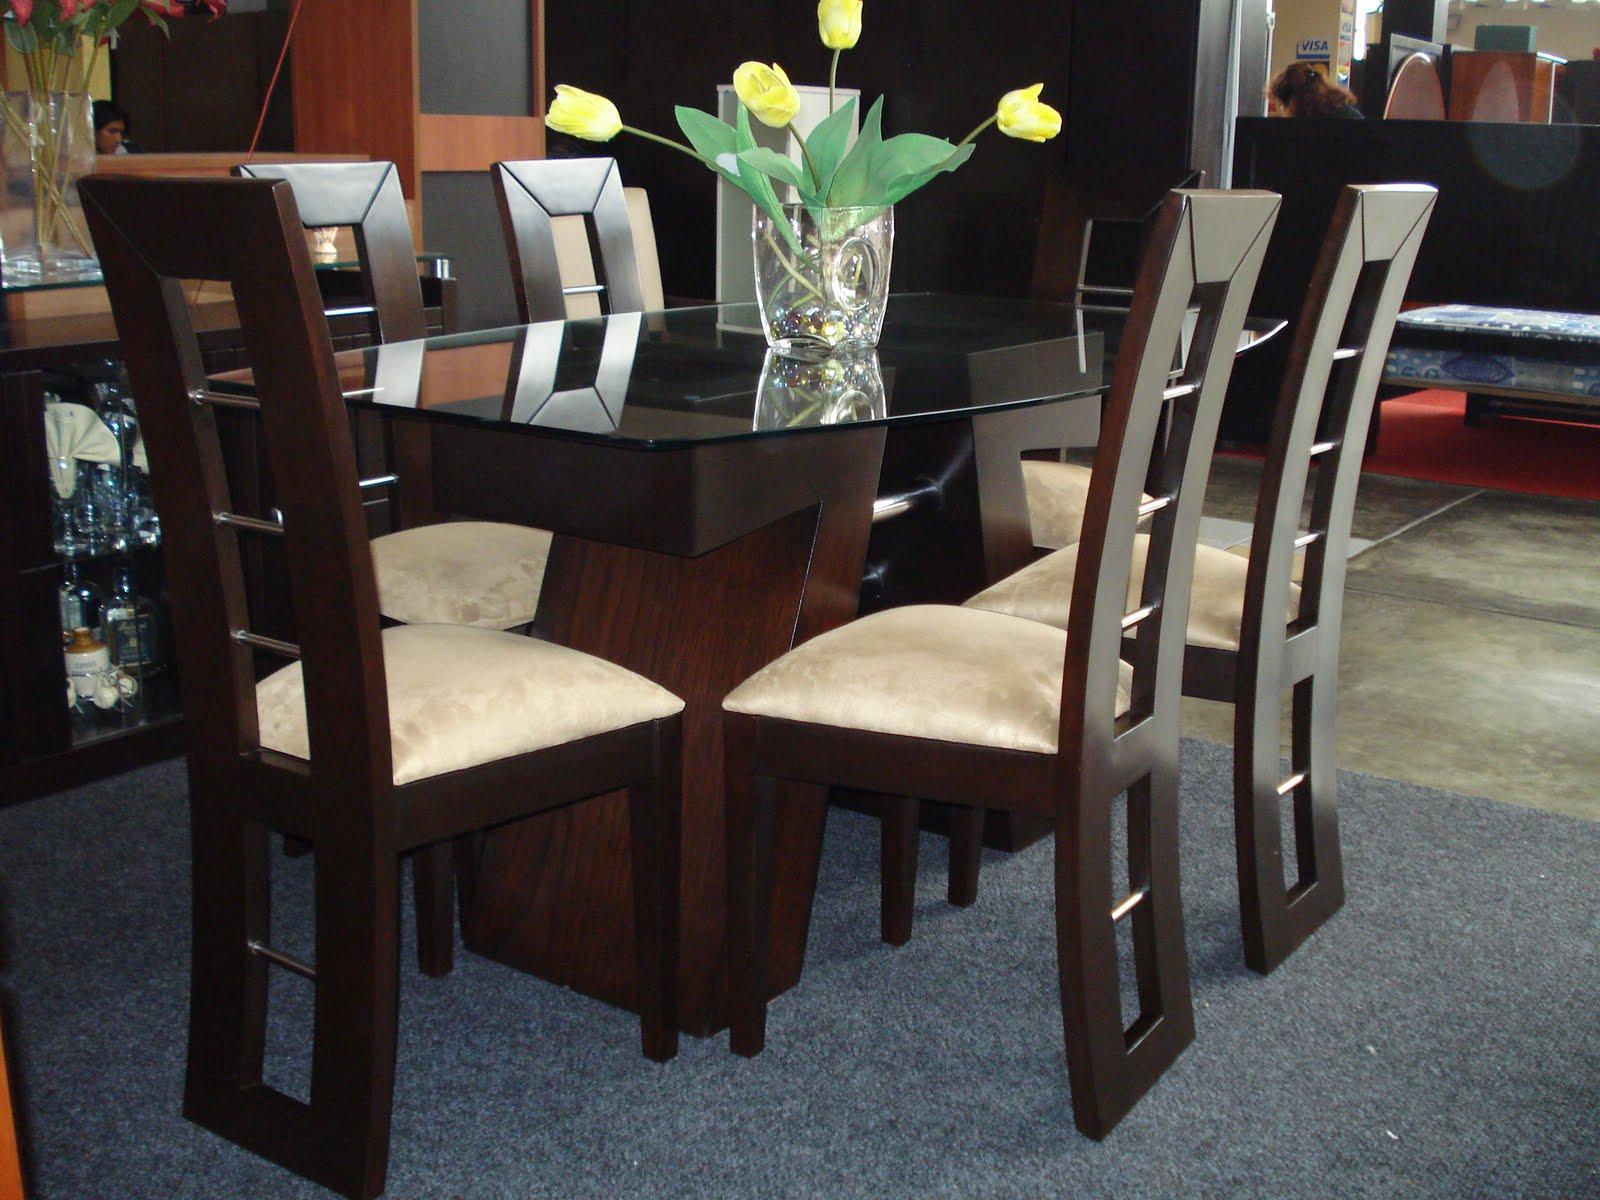 Comercial cobala s a comedores for Juego de comedor de madera de 6 sillas